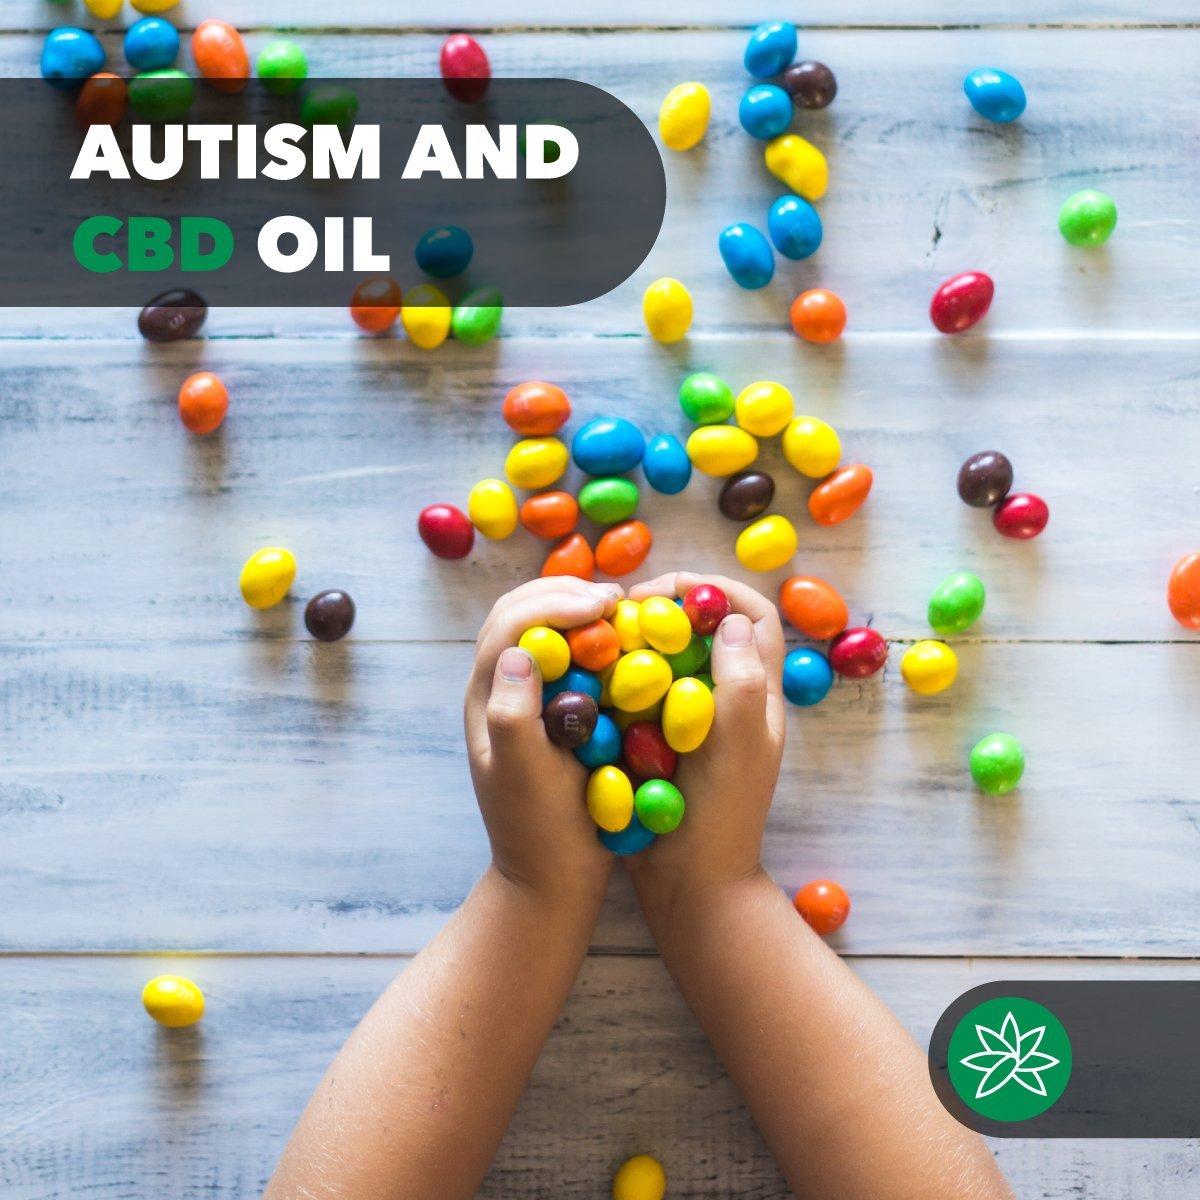 Autisms and CBD oil